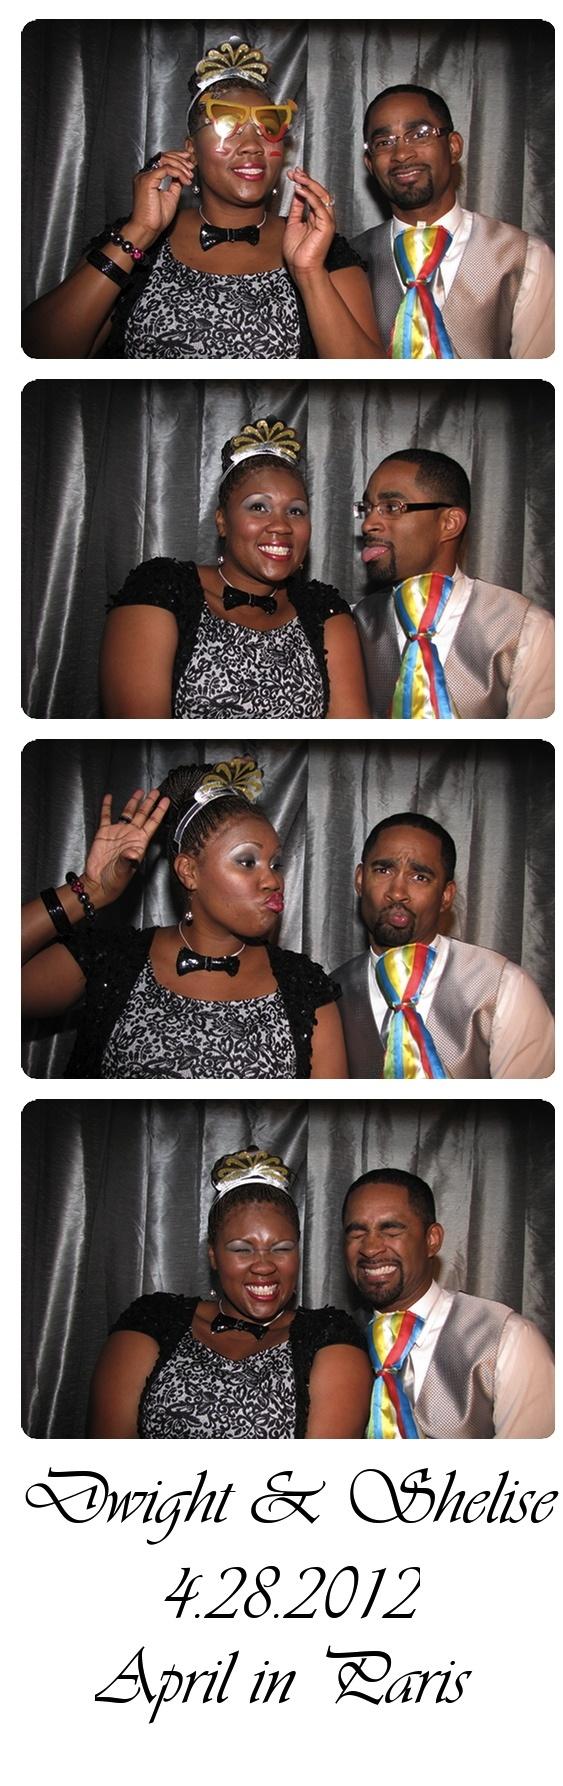 Wedding Photobooth!